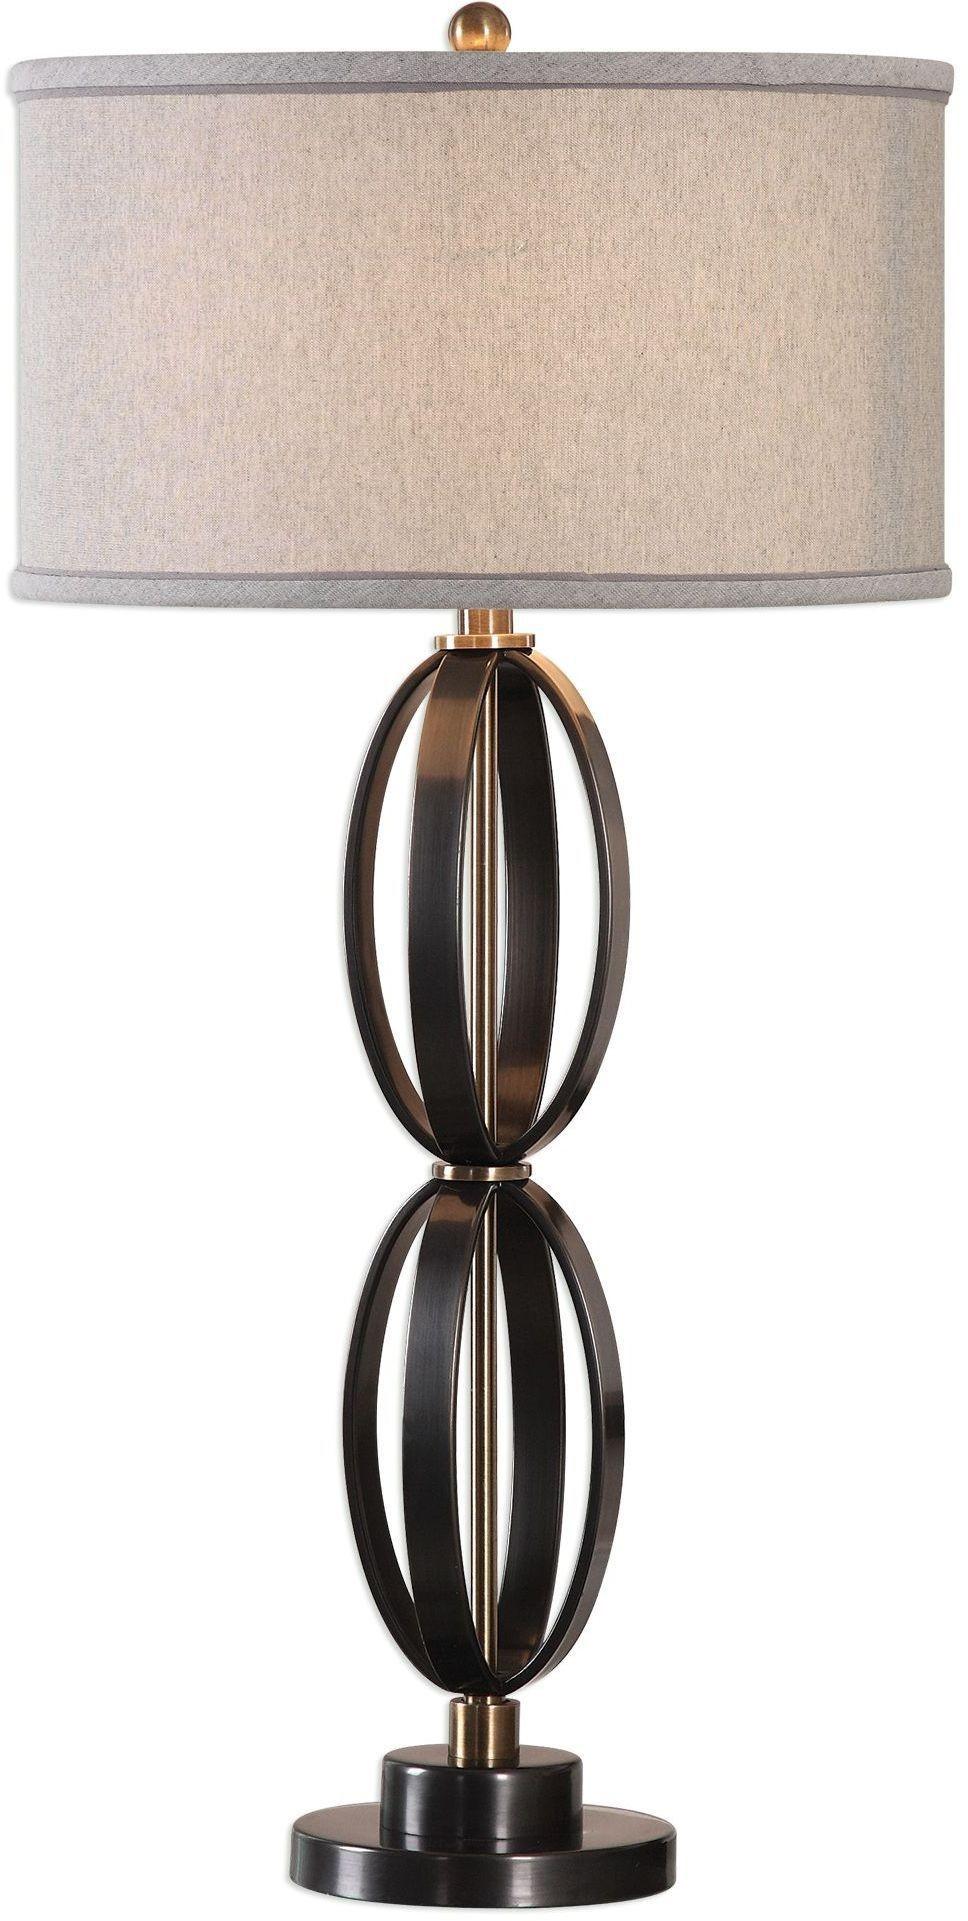 moretti oil rubbed bronze table lamp 27317 1 uttermost. Black Bedroom Furniture Sets. Home Design Ideas